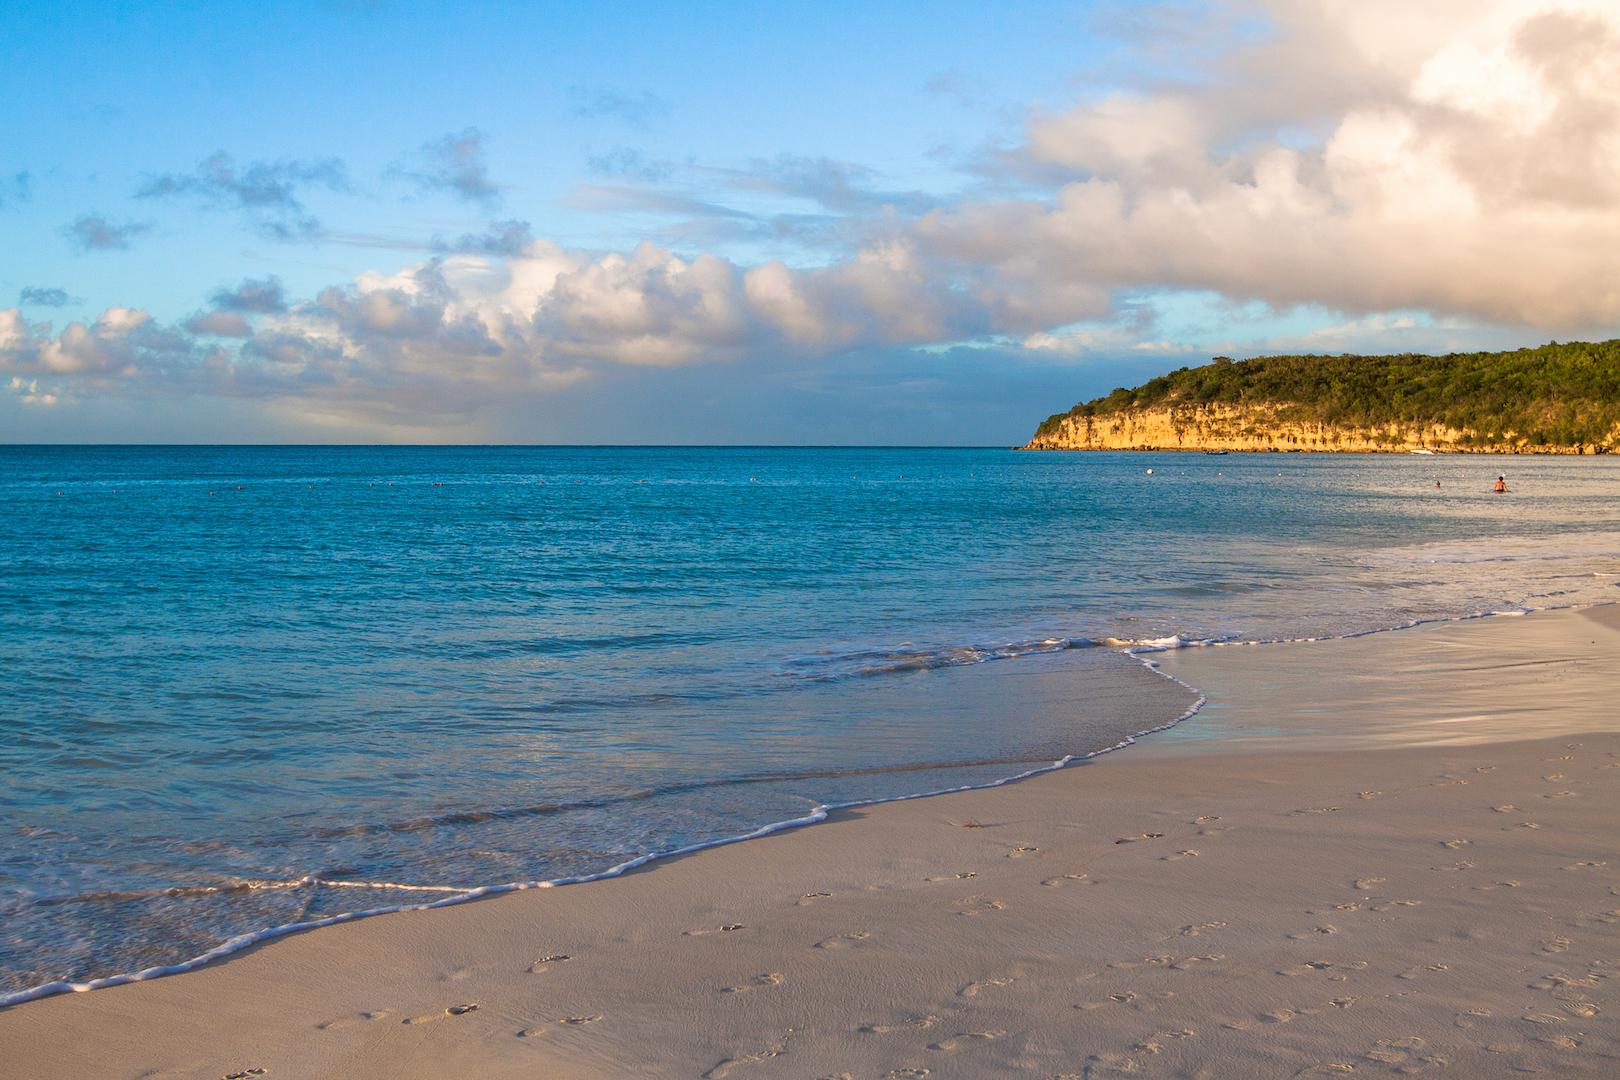 Top 10 Beach Vacation Slideshow Songs - Eat Work Travel ...